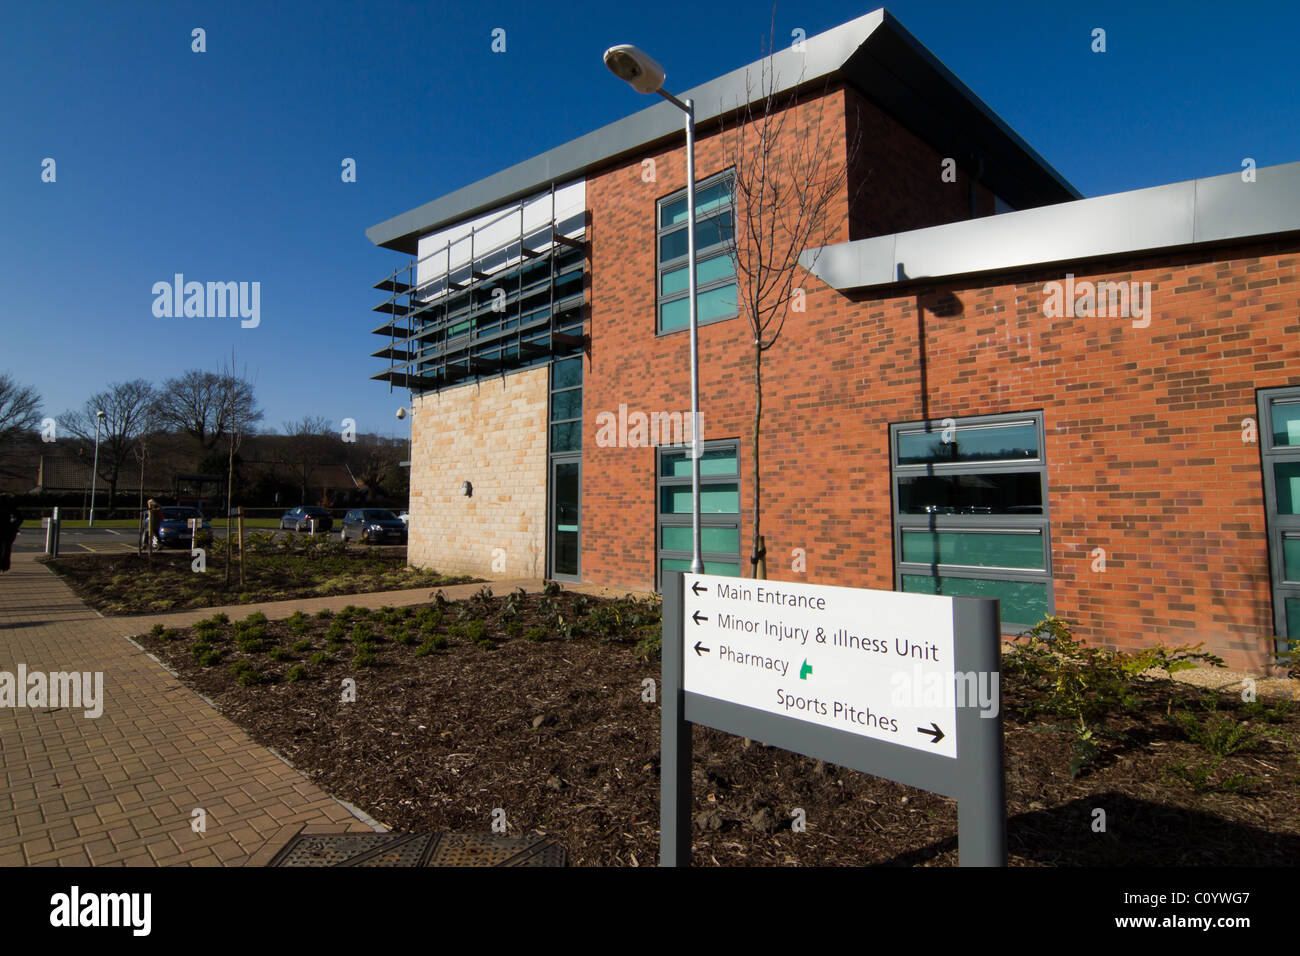 Blaydon leisure and primary care centre, New Build, Tyneside. - Stock Image